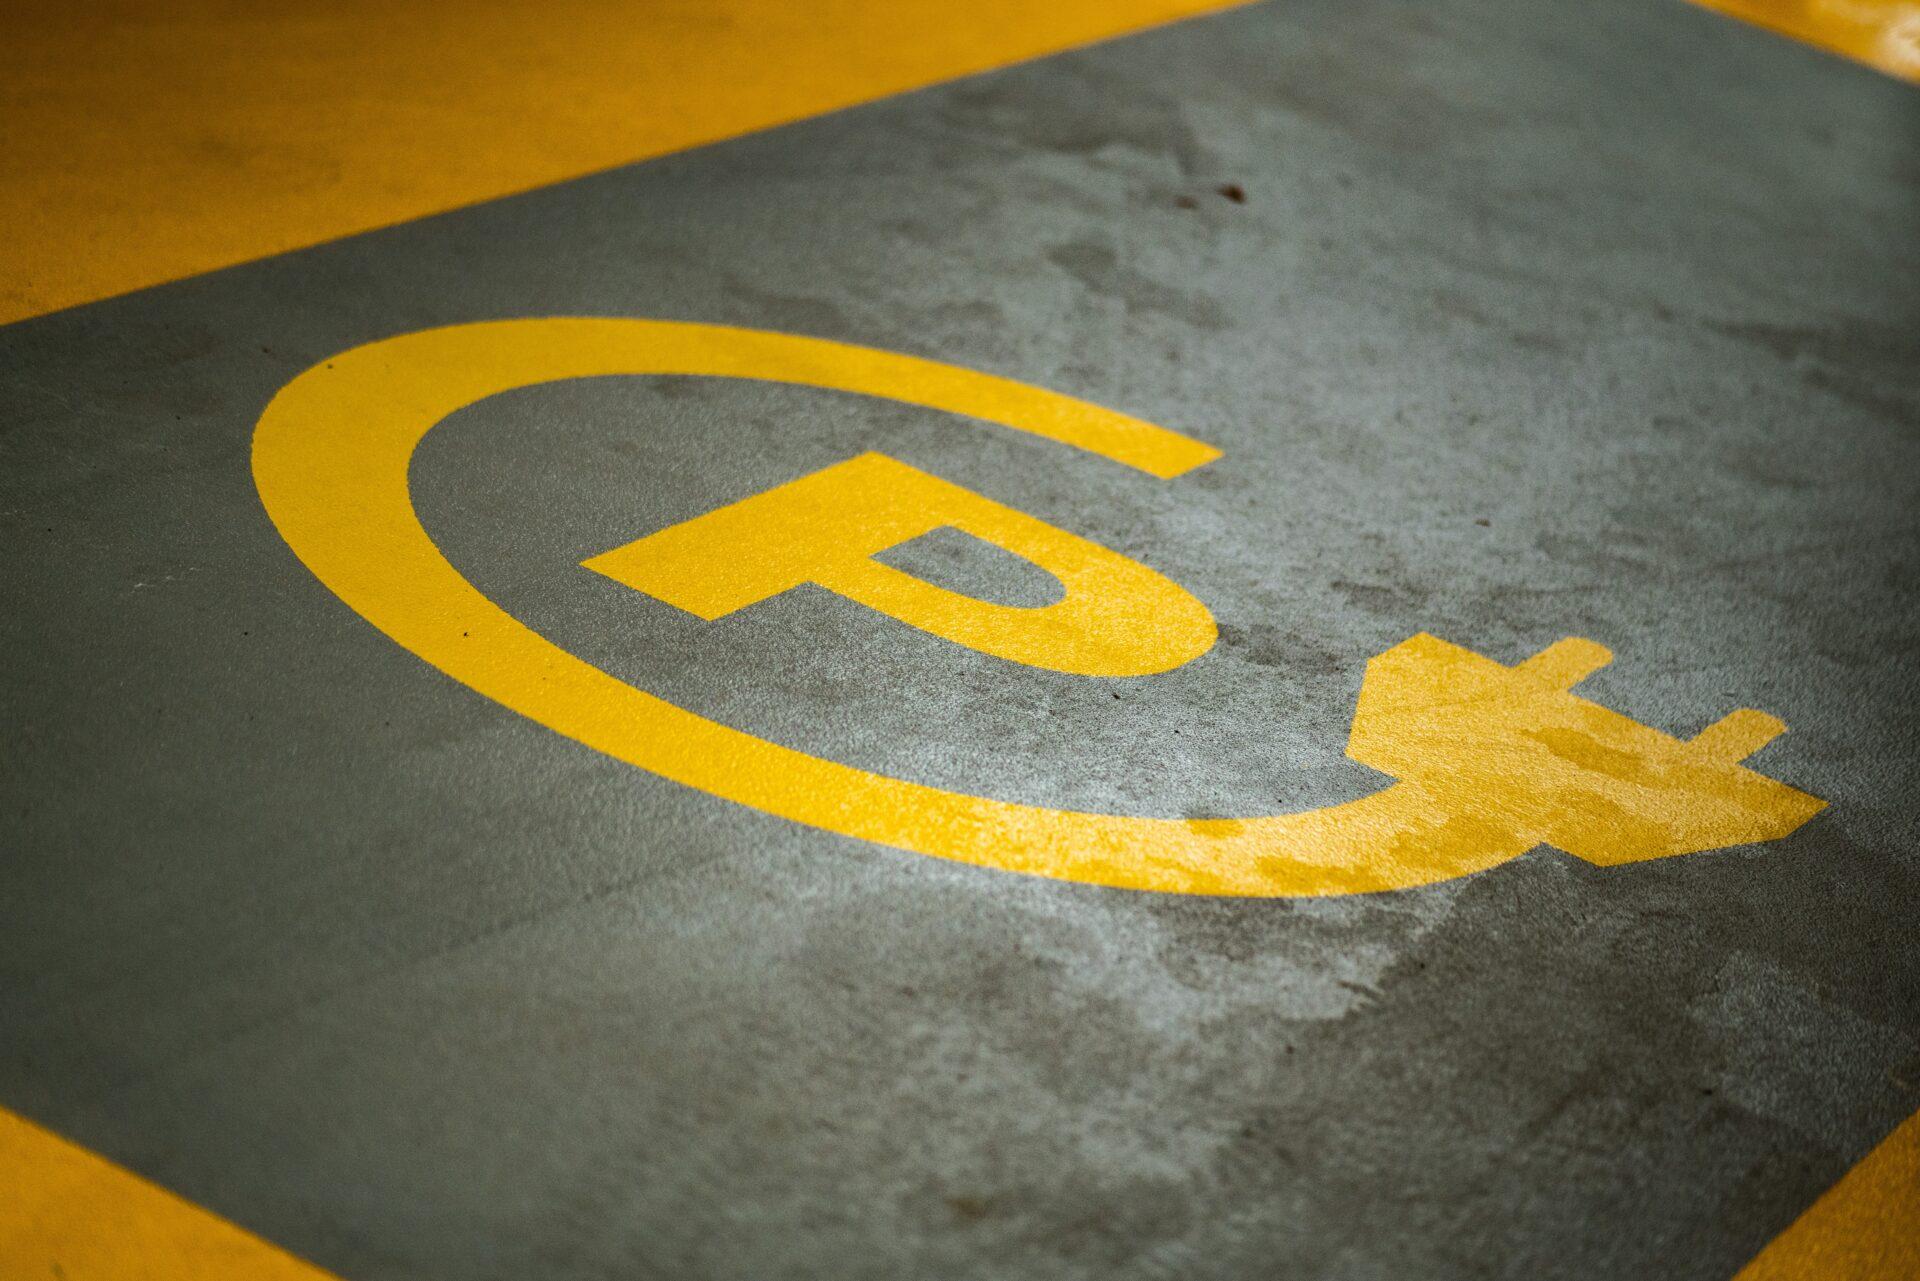 Parking charging